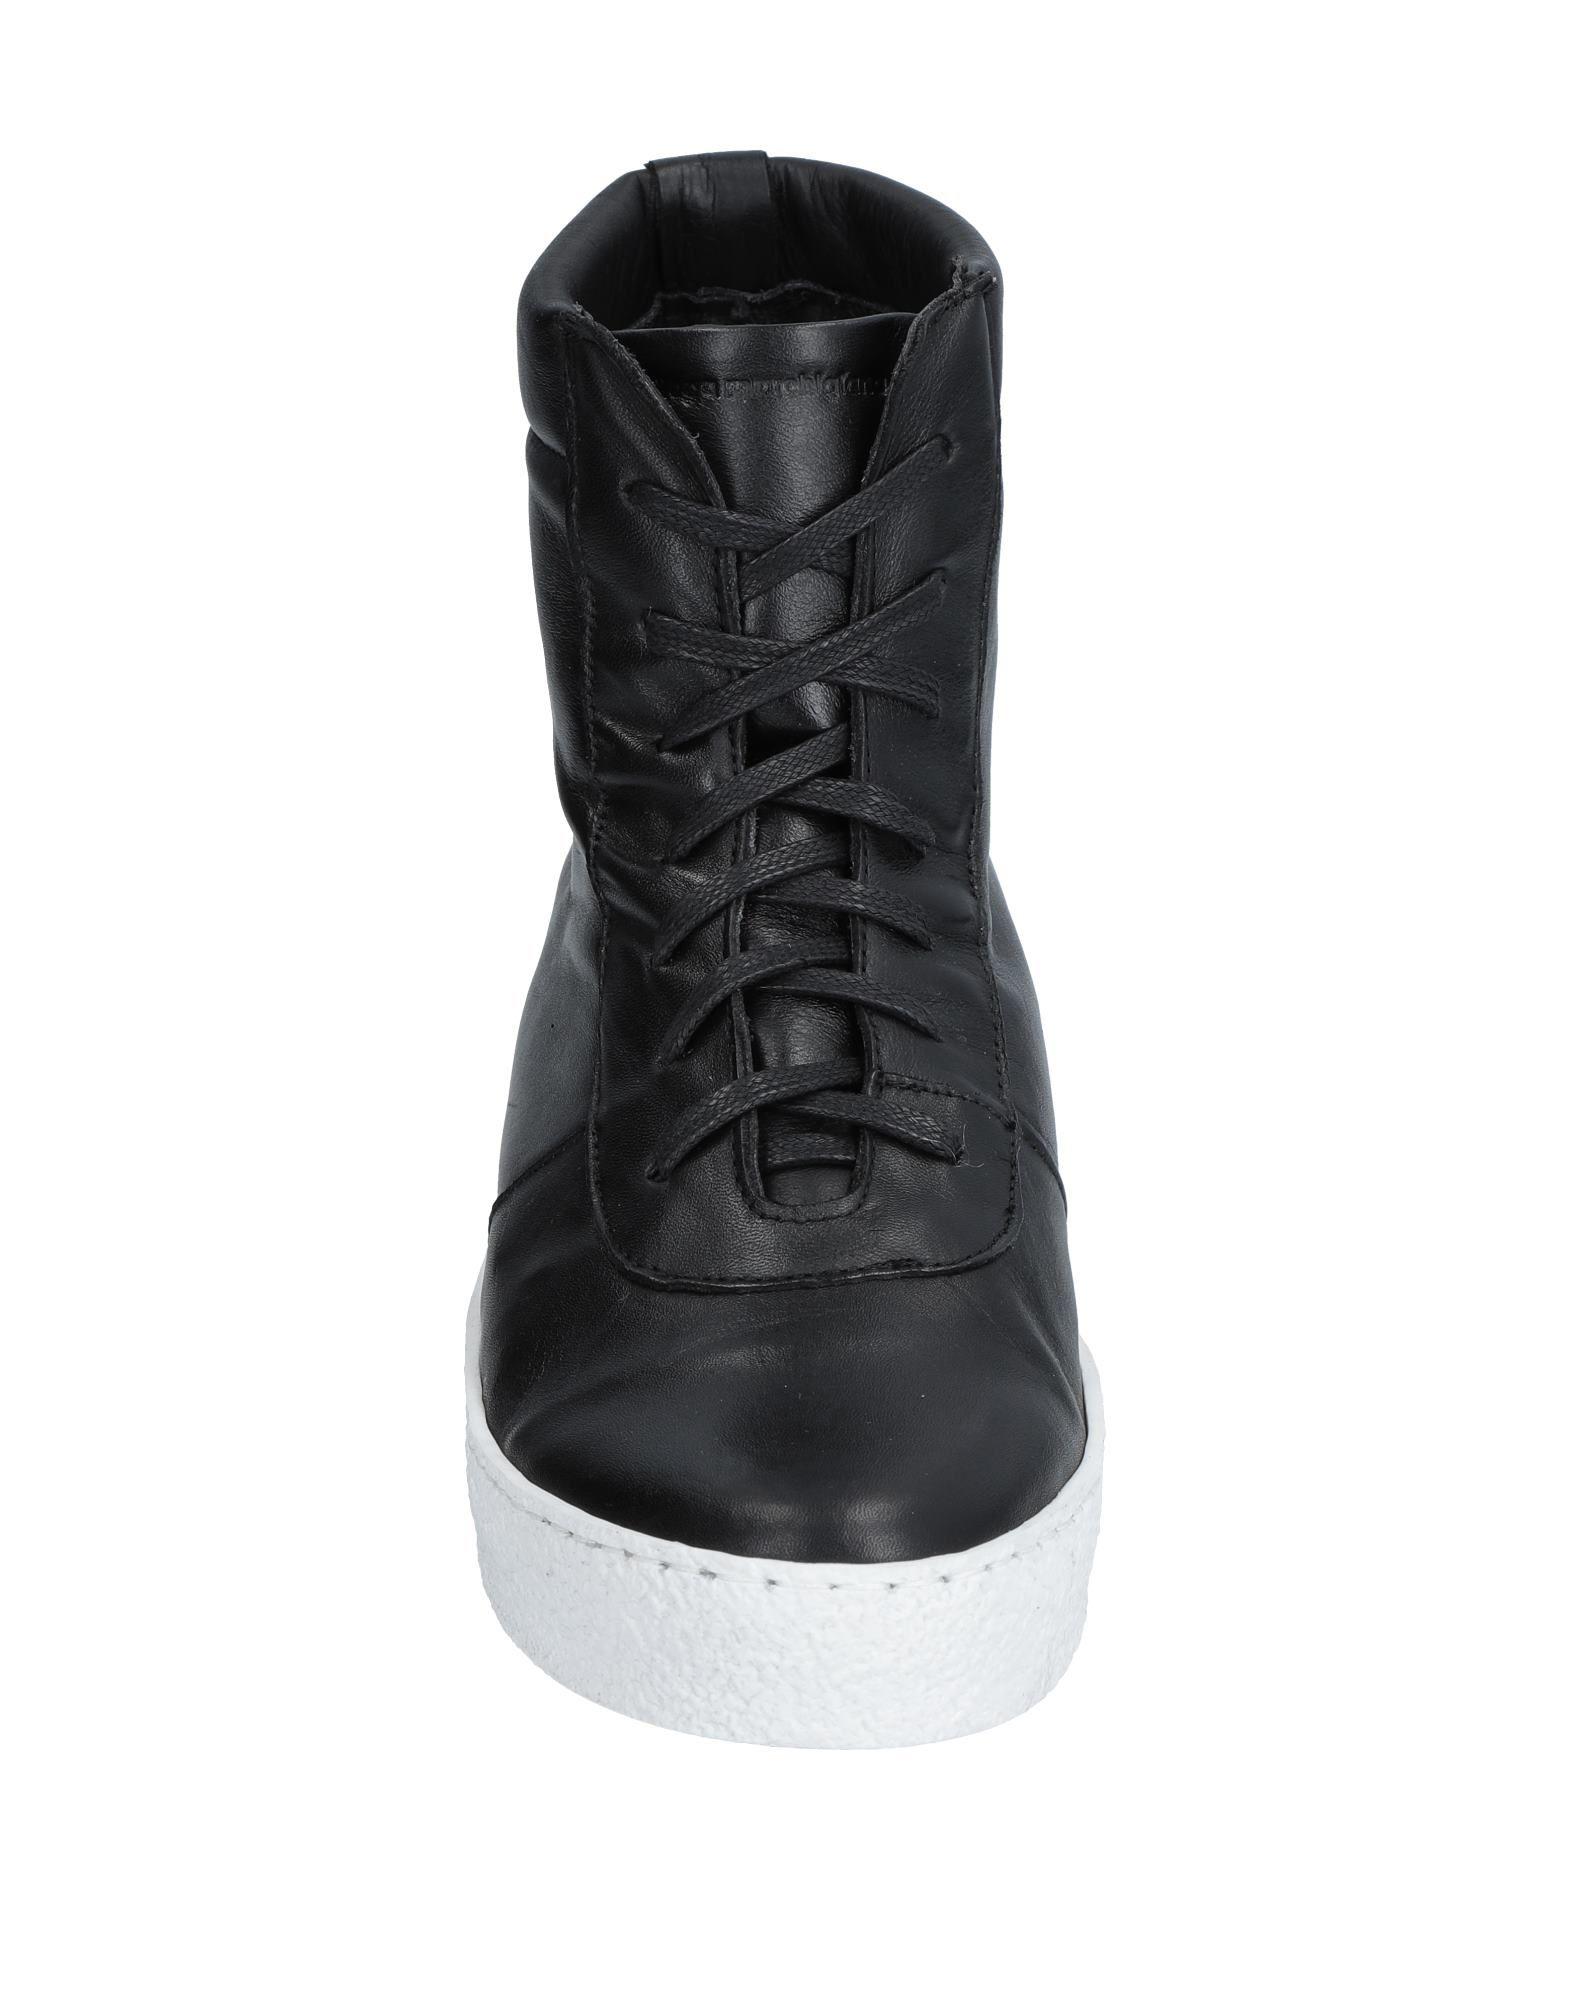 Sneakers Bottega Marchigiana Uomo 11544379VO - 11544379VO Uomo 981ad3